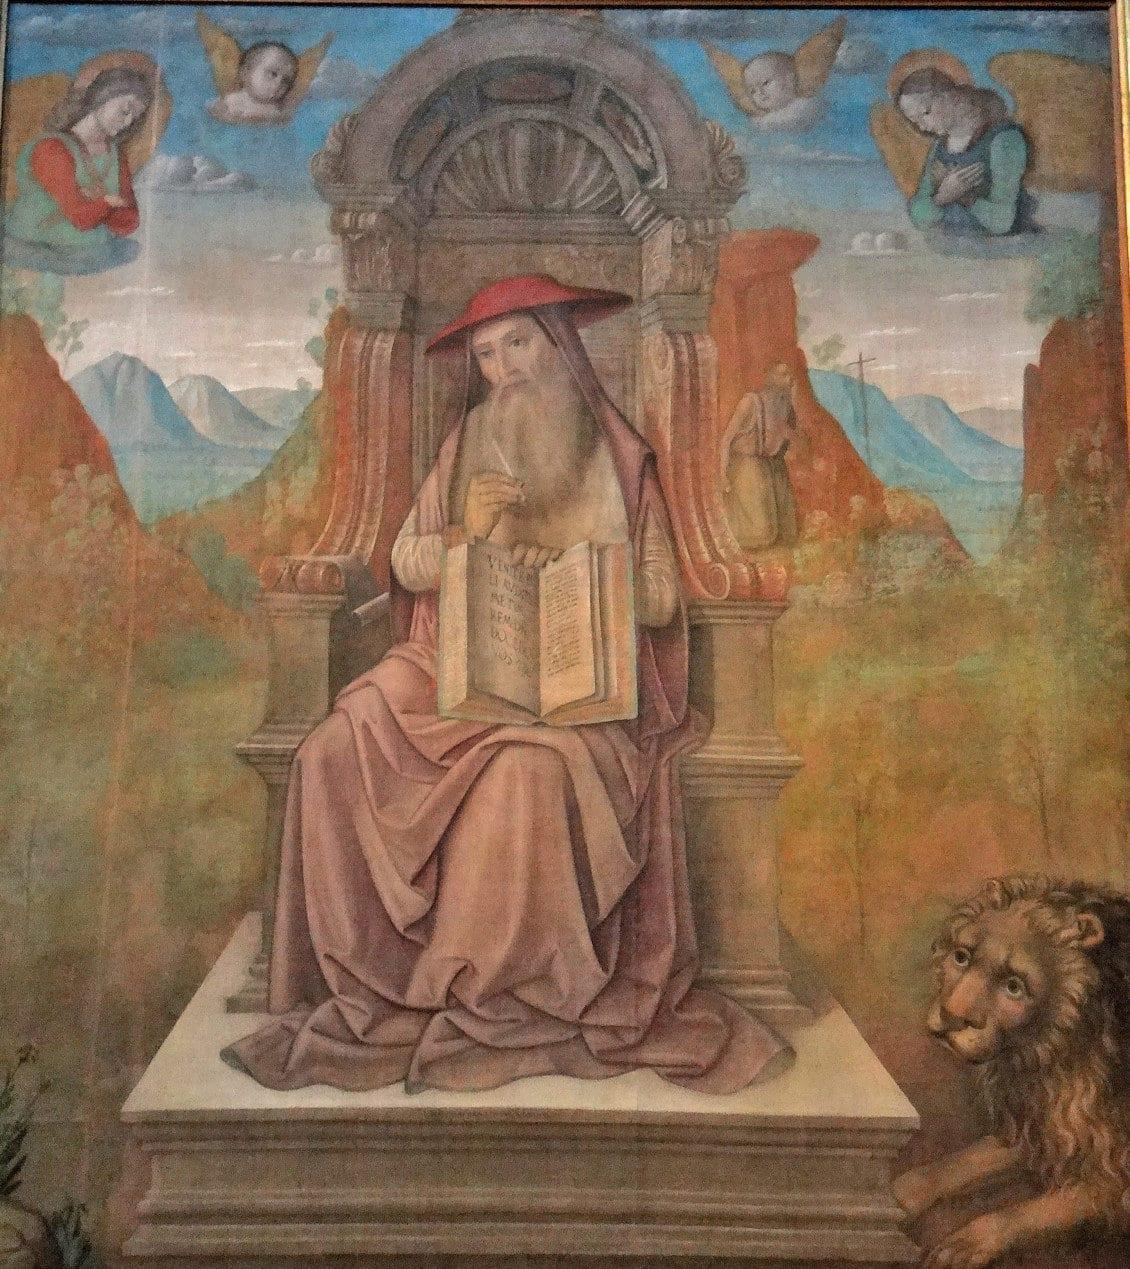 Vatican Art Gallery - Giovanni Santi (1439 - 1494) - St Jerome enthroned